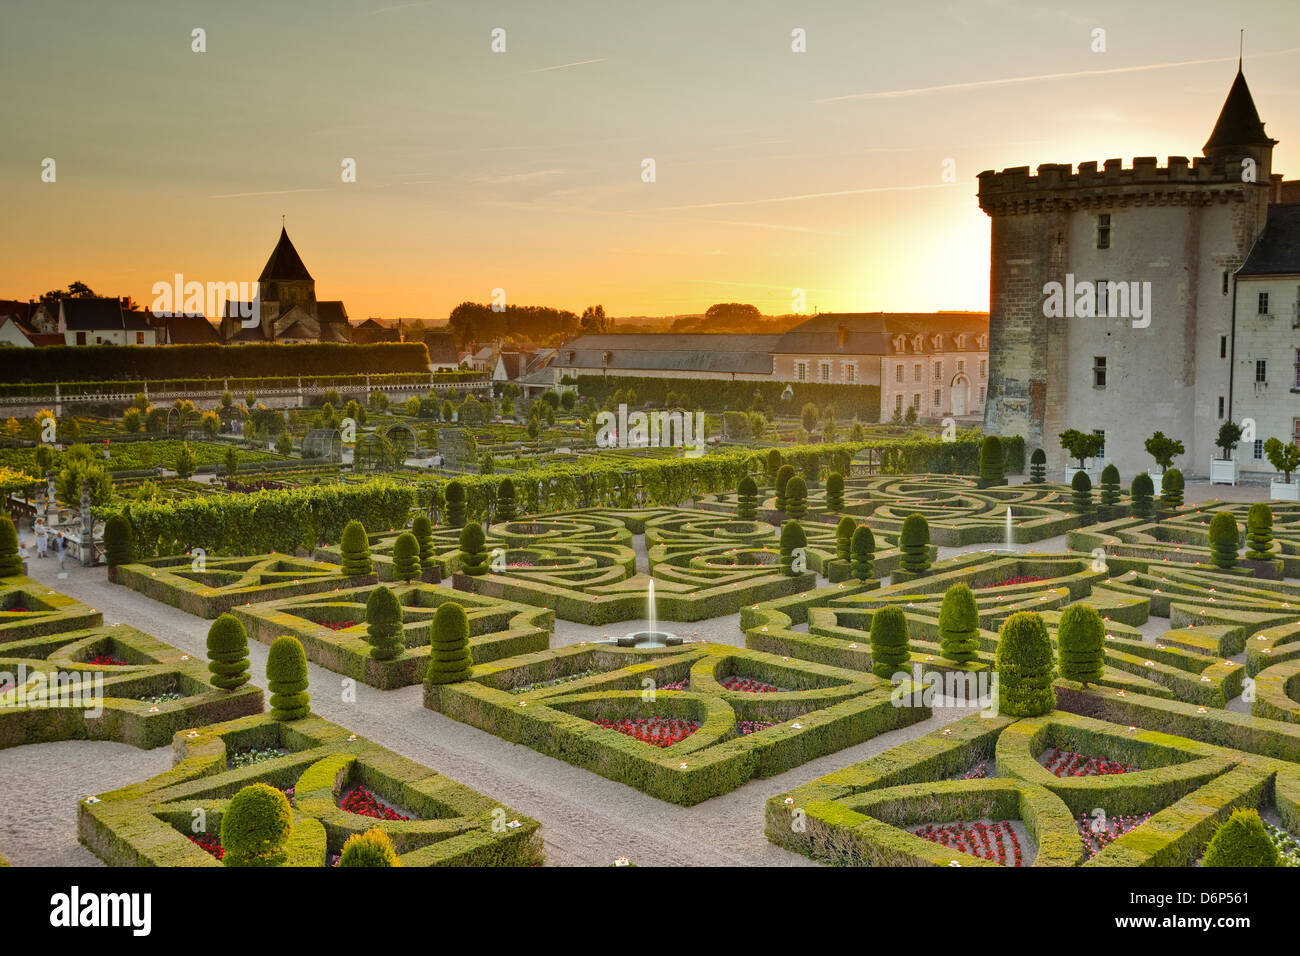 The Chateau de Villandry and its gardens at sunset, UNESCO World Heritage Site, Indre-et-Loire, Loire Valley, France, Stock Foto